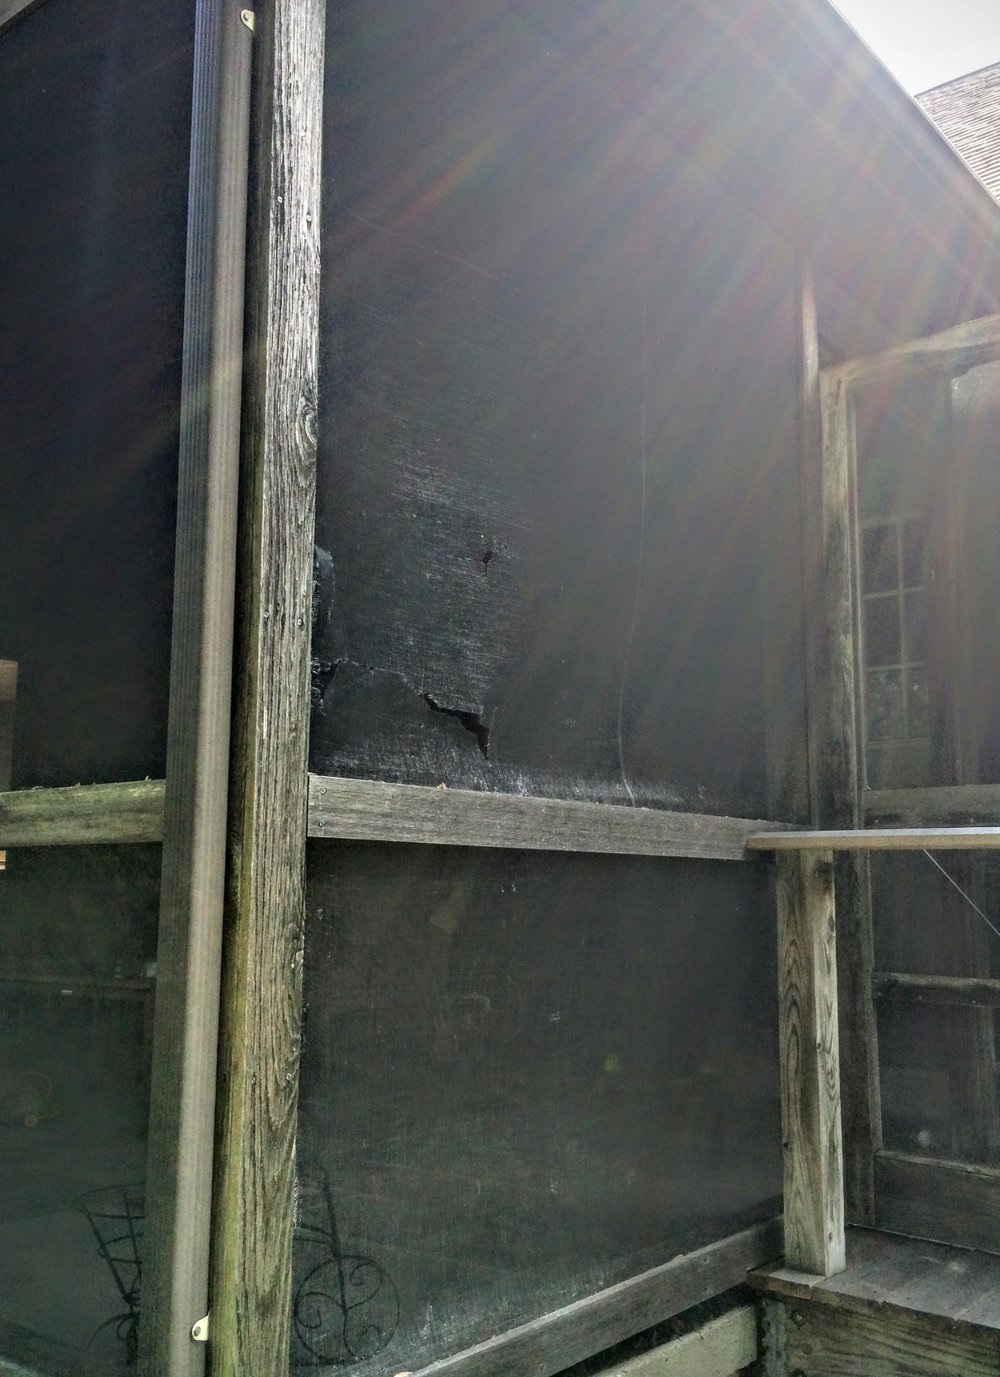 Renue Glass and Screen Repair Cedar Patio Pavilion (Before Photos)